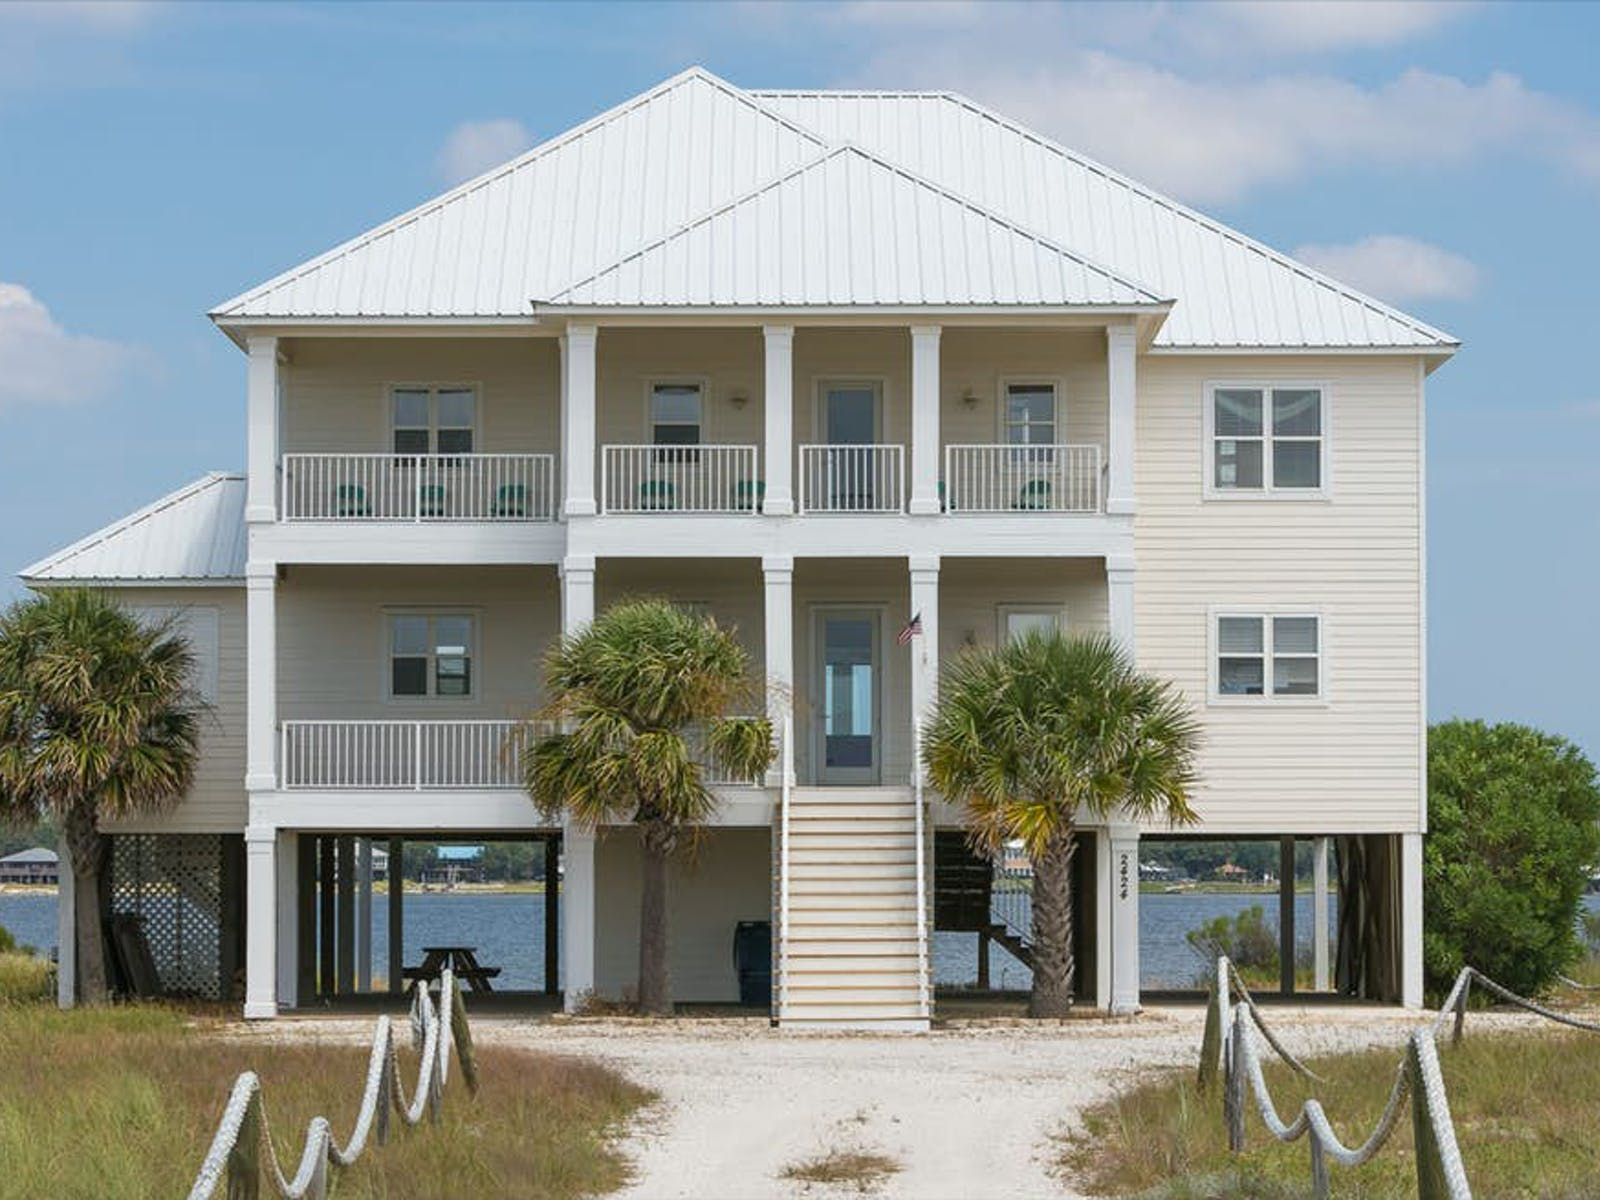 Alabama Wedding-Friendly beach house rental